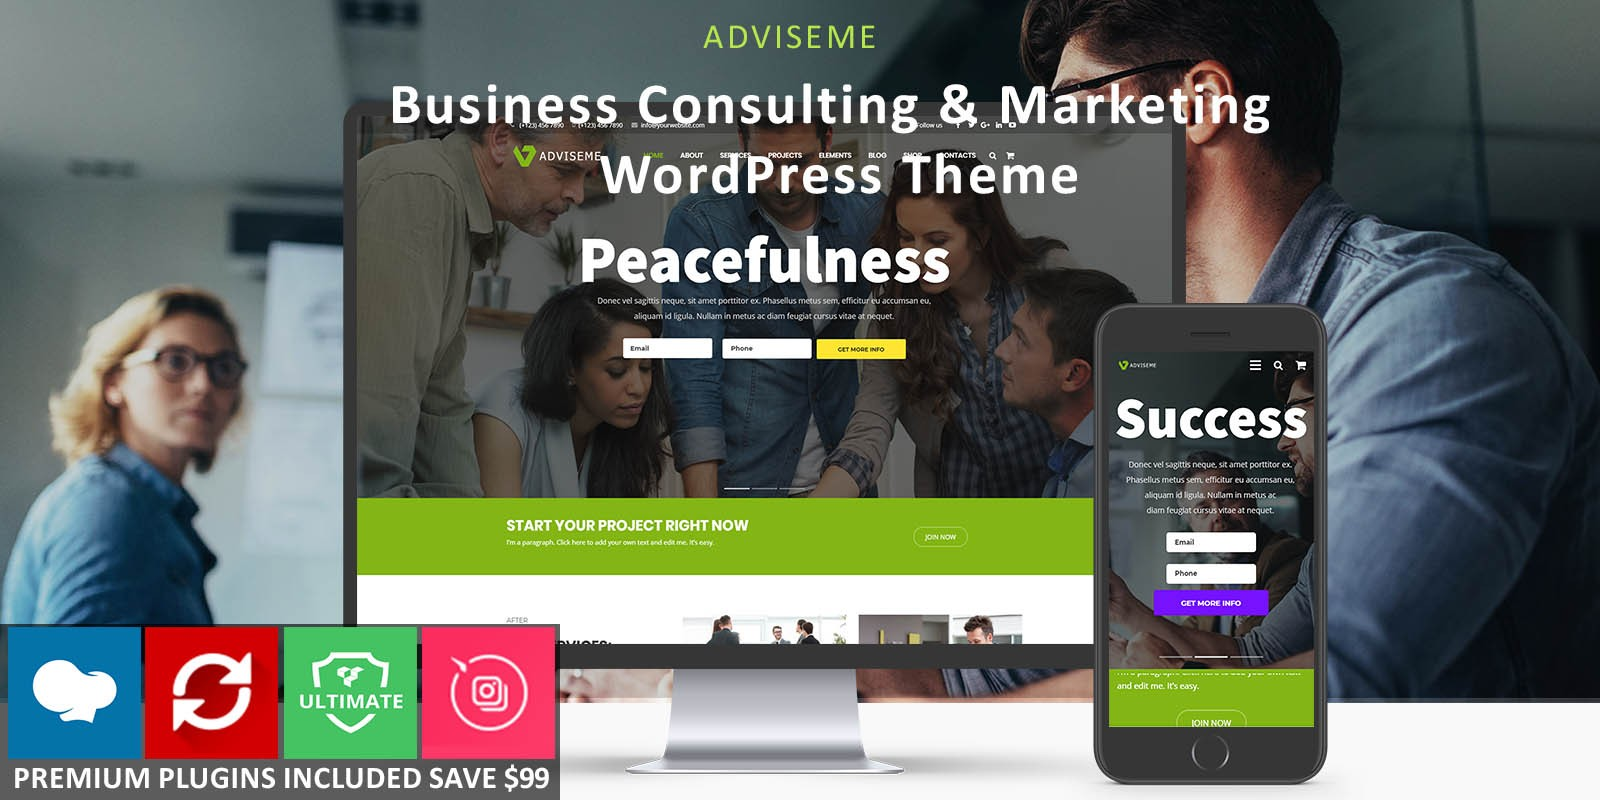 Adviseme - Consulting Business WordPress Theme